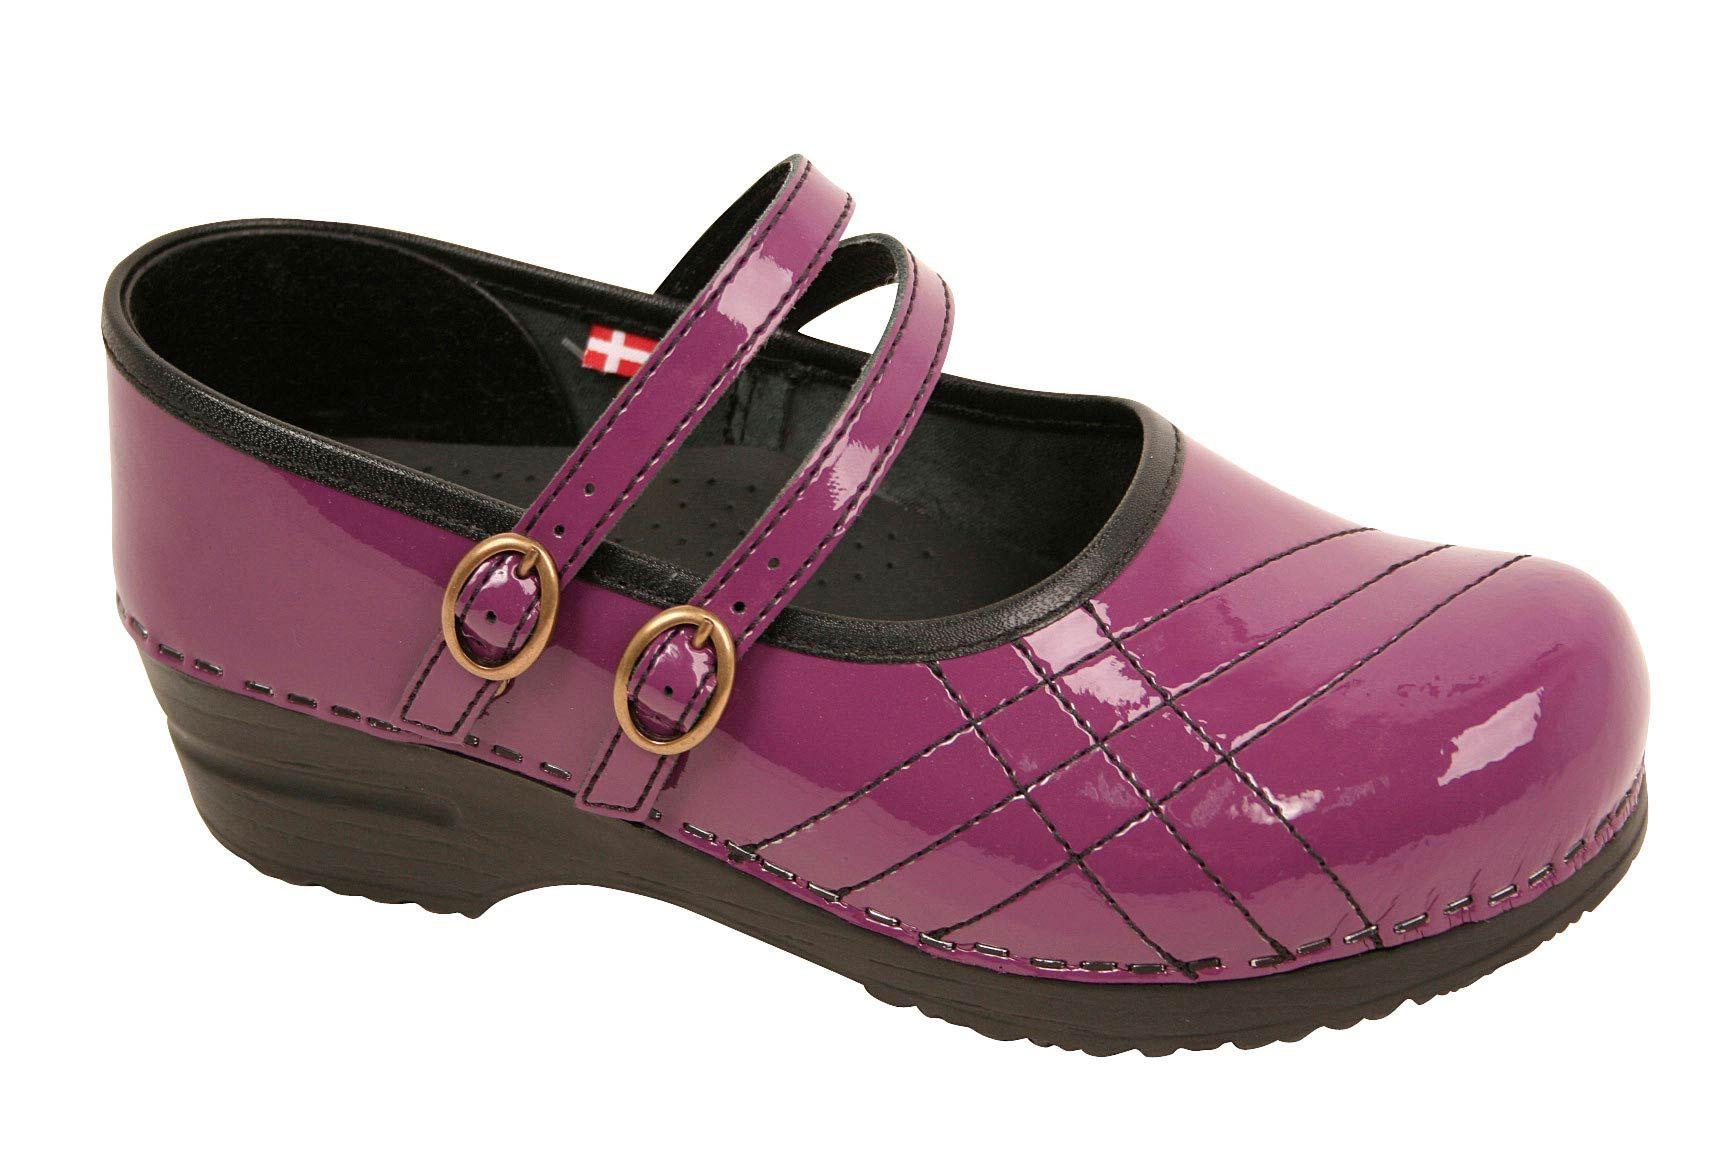 Zapatos rojos Sanita infantiles zW0jXv